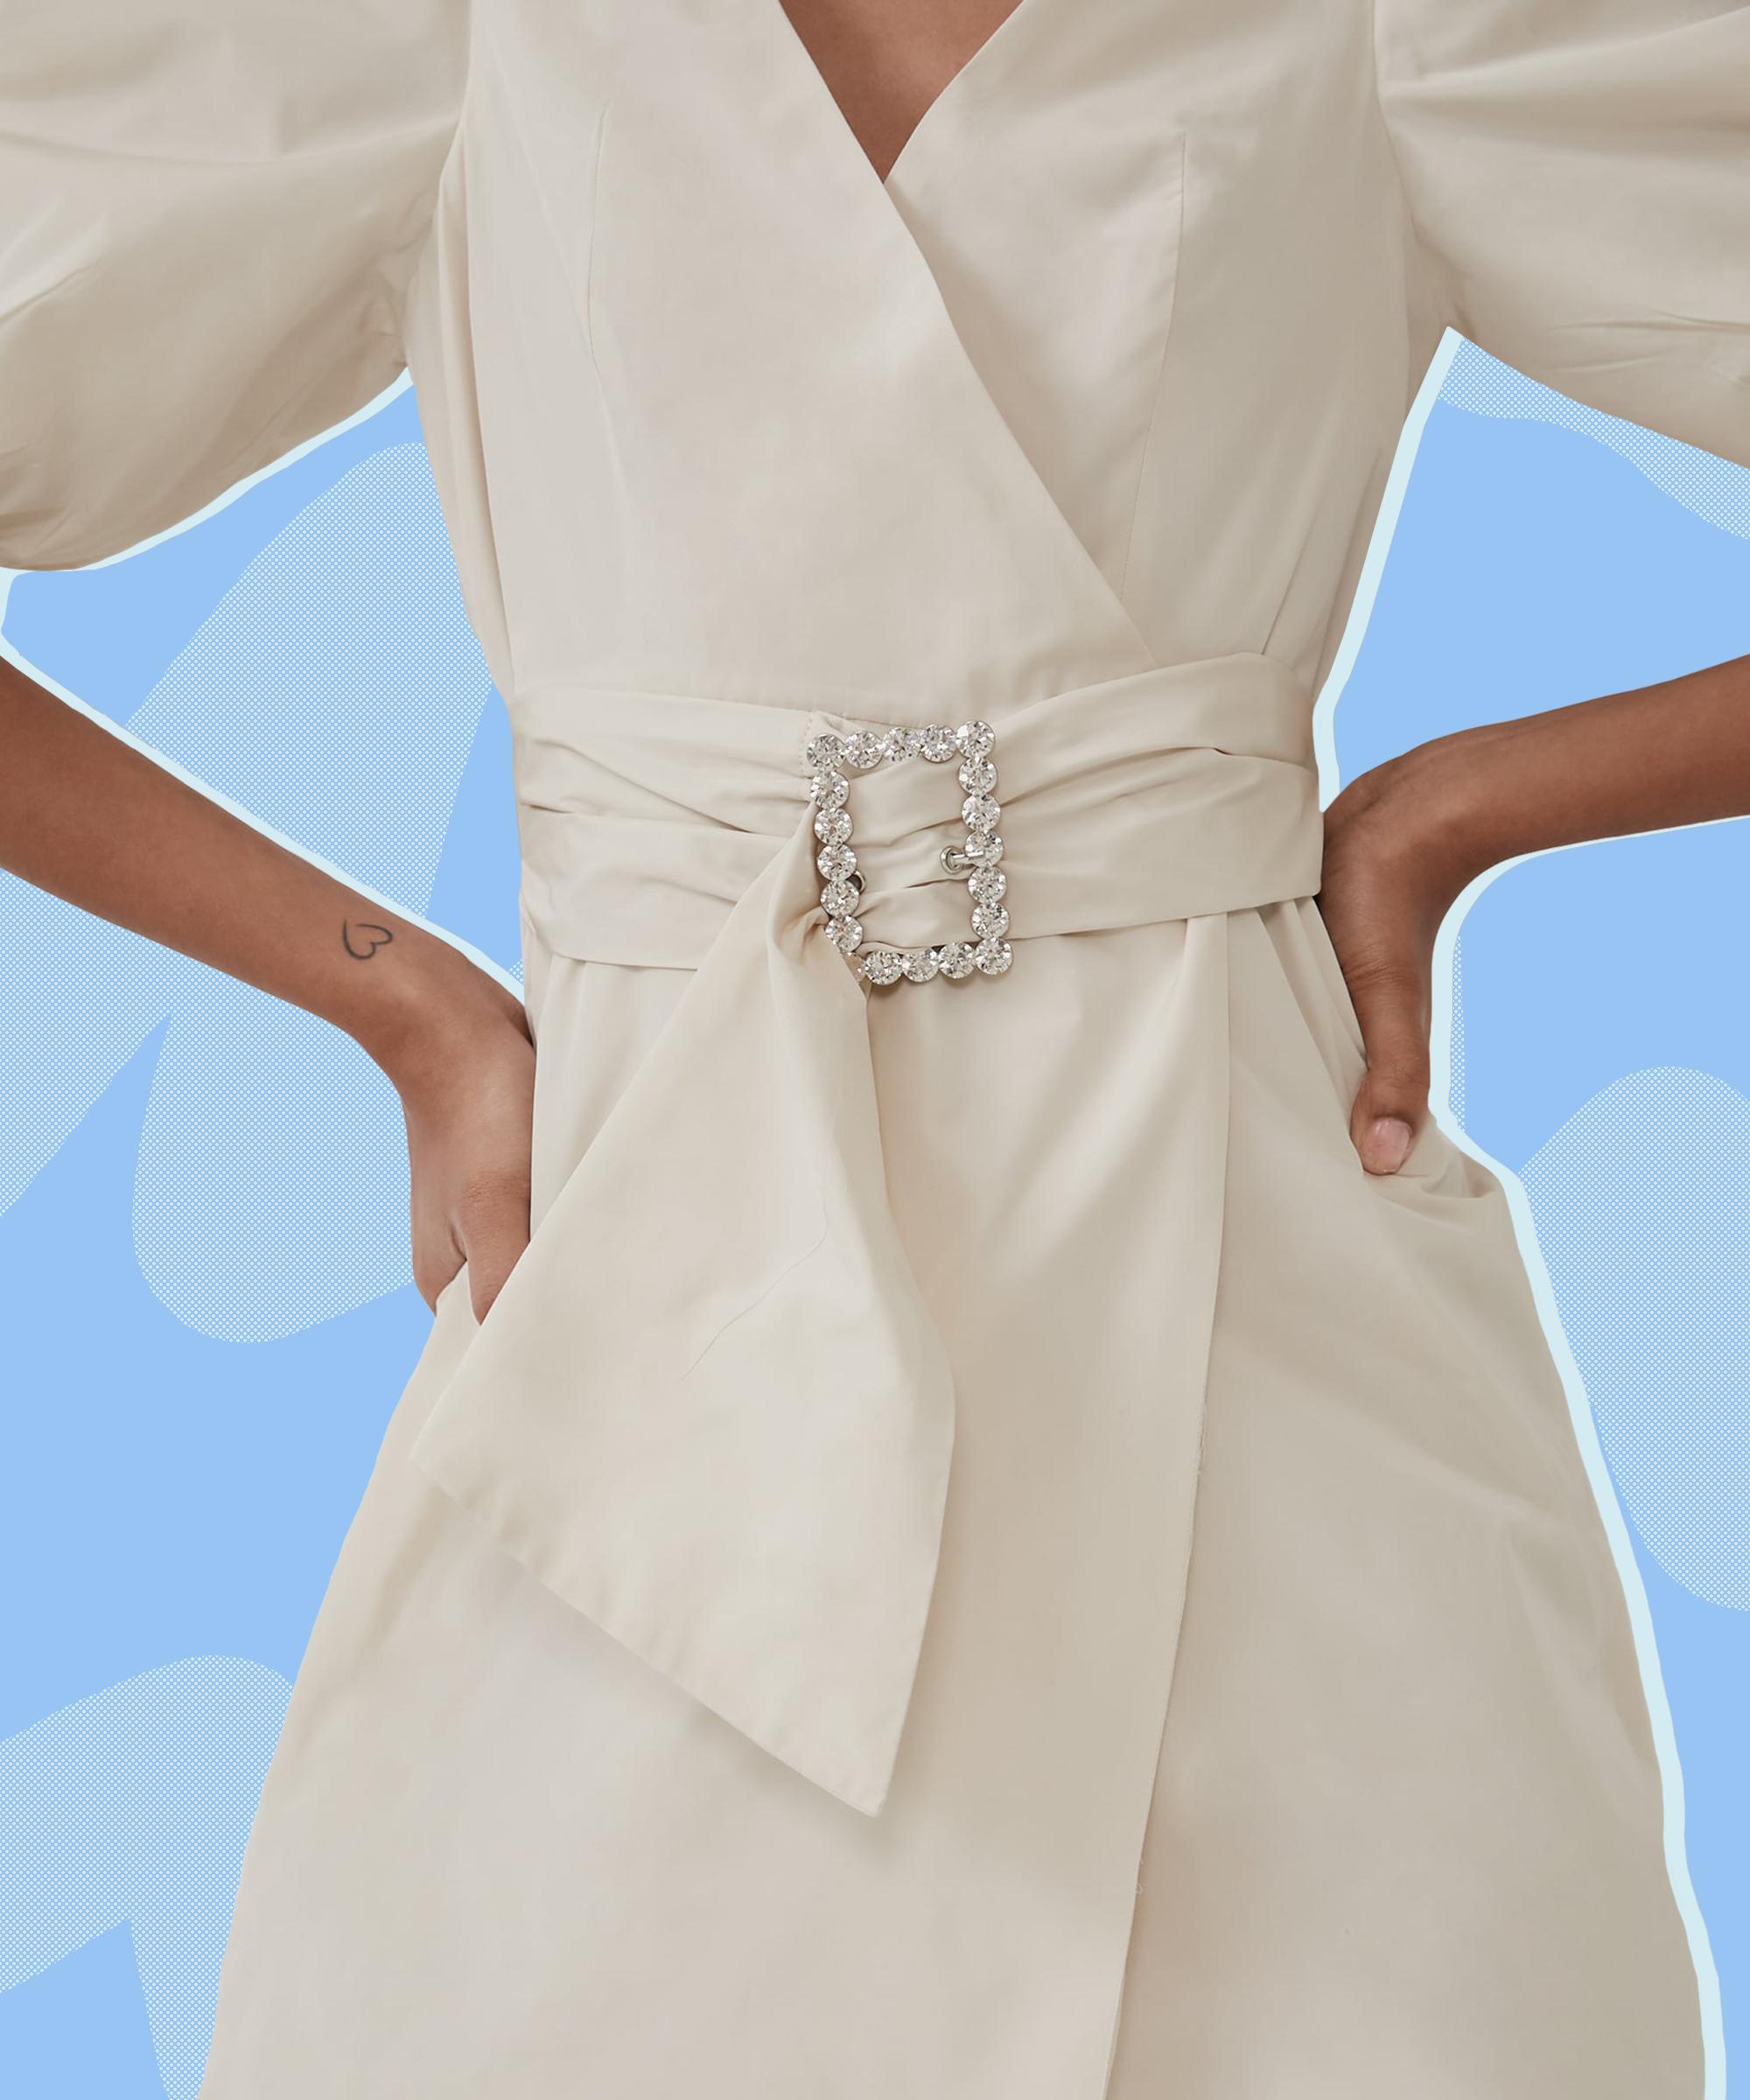 15 Wedding Dresses That Aren't Actually Wedding Dresses